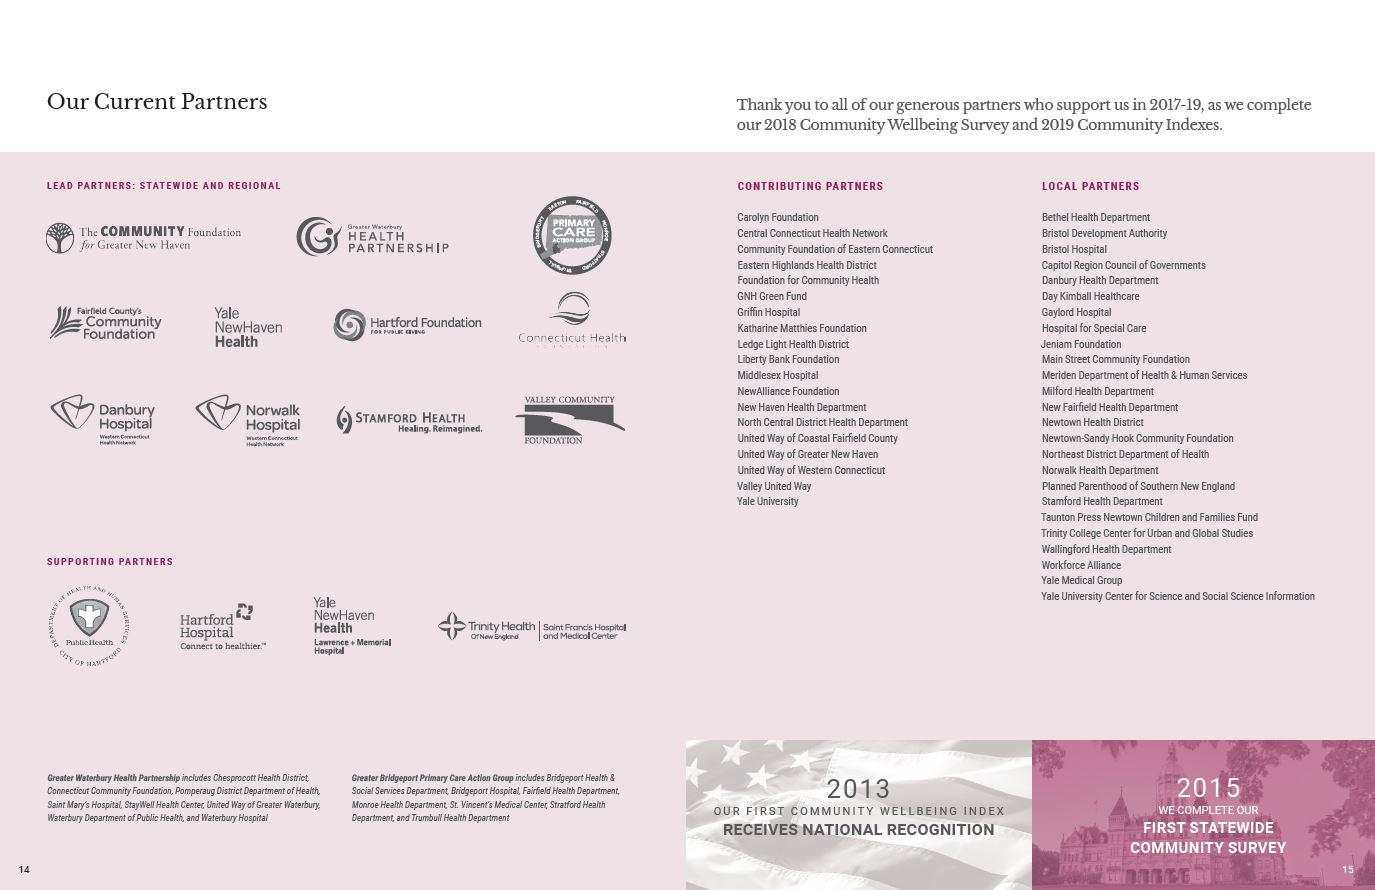 DataHaven 2017 2019 community index partners